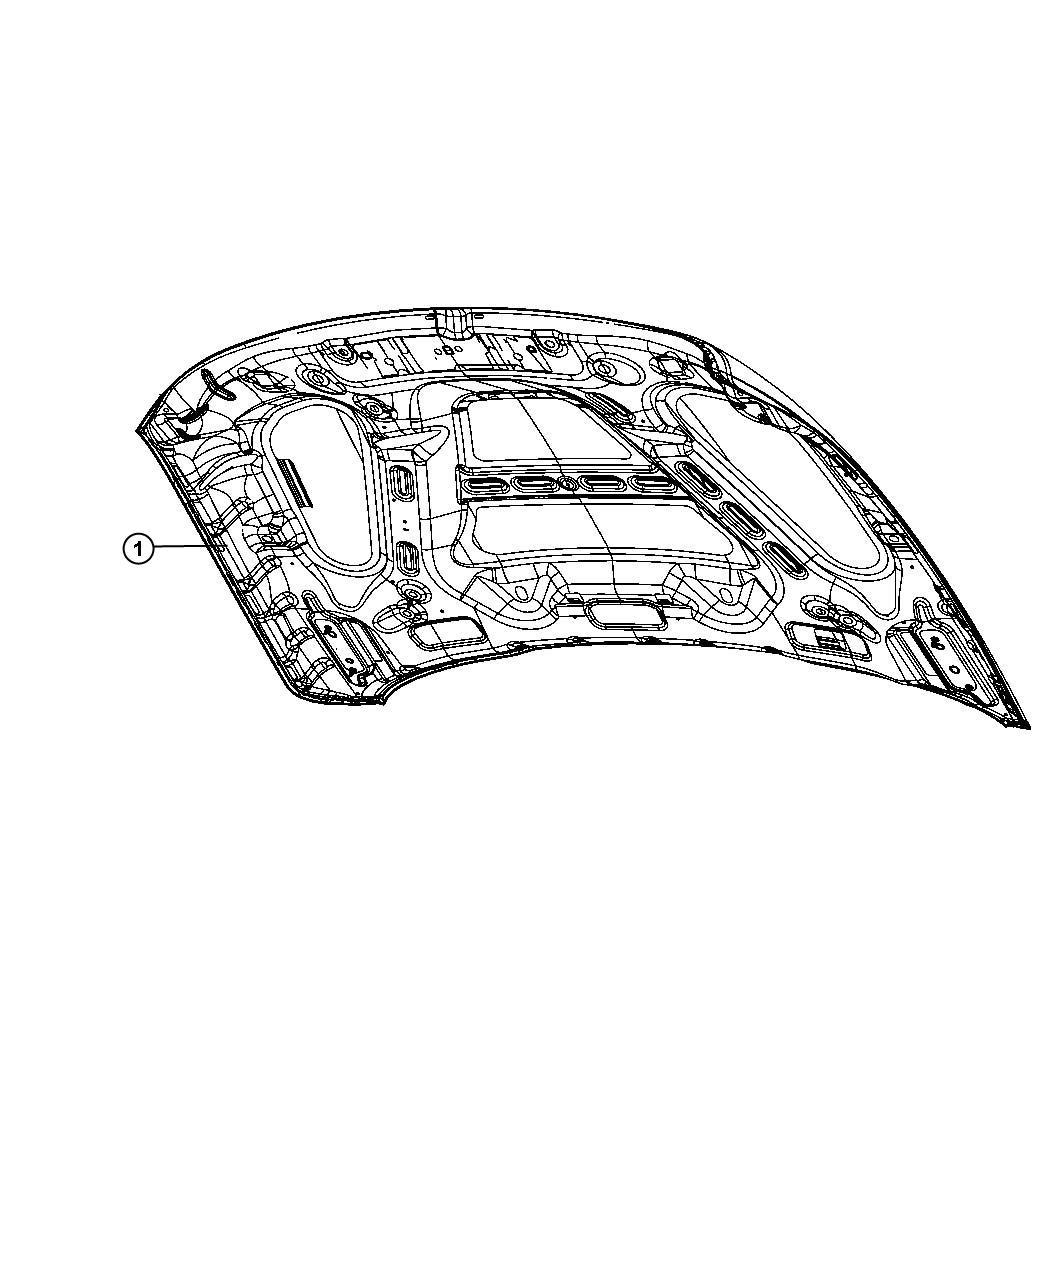 Dodge Ram 1500 Label. Vehicle emission control in. [nae